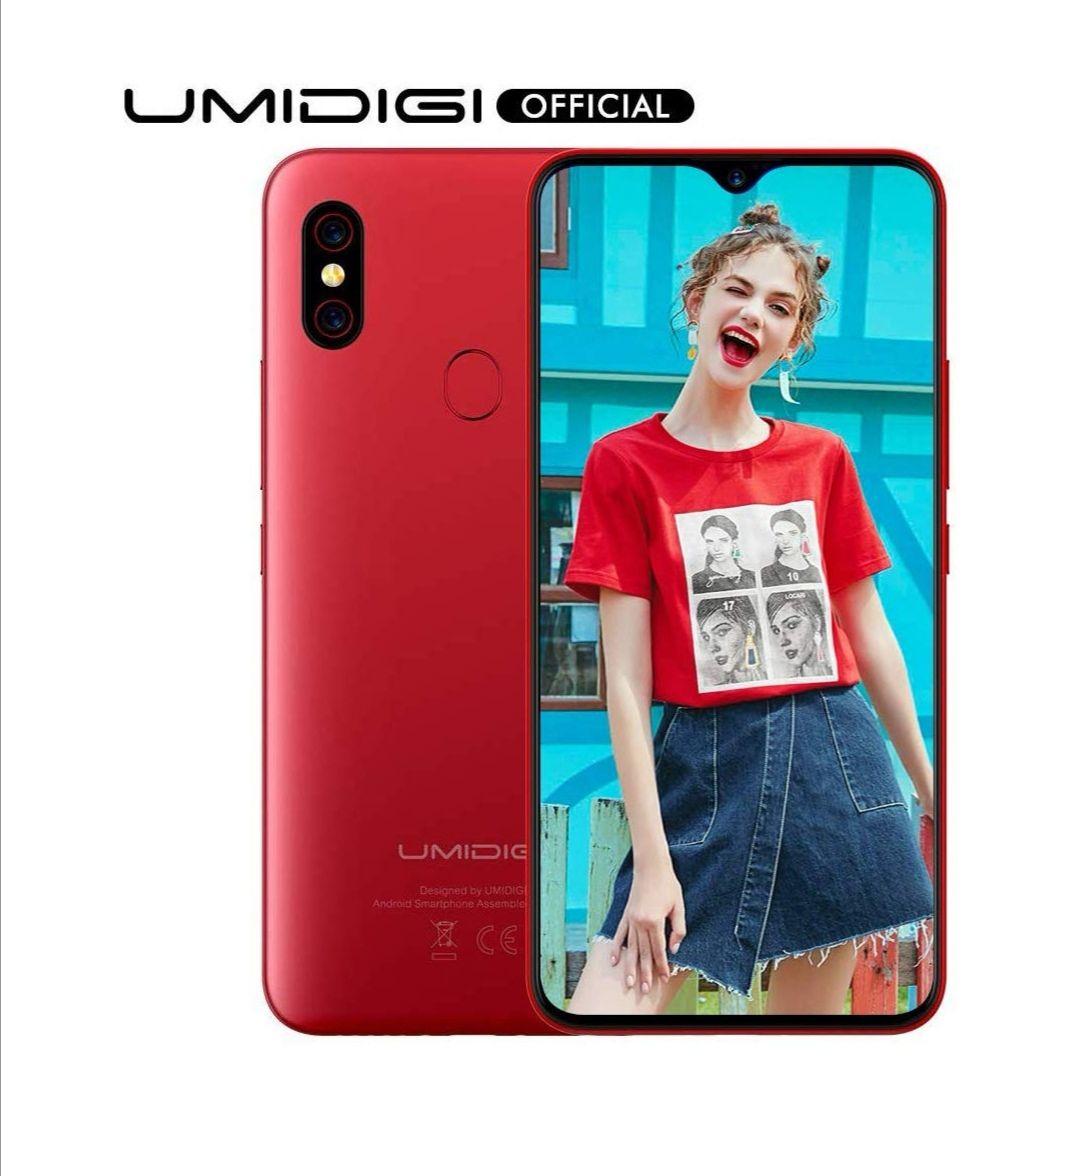 UMIDIGI F1 Smartphone NFC - 5150mAh Battery 128GB 4GB RAM £144.99 @ E-M-I EU-Shop Fulfilled By Amazon